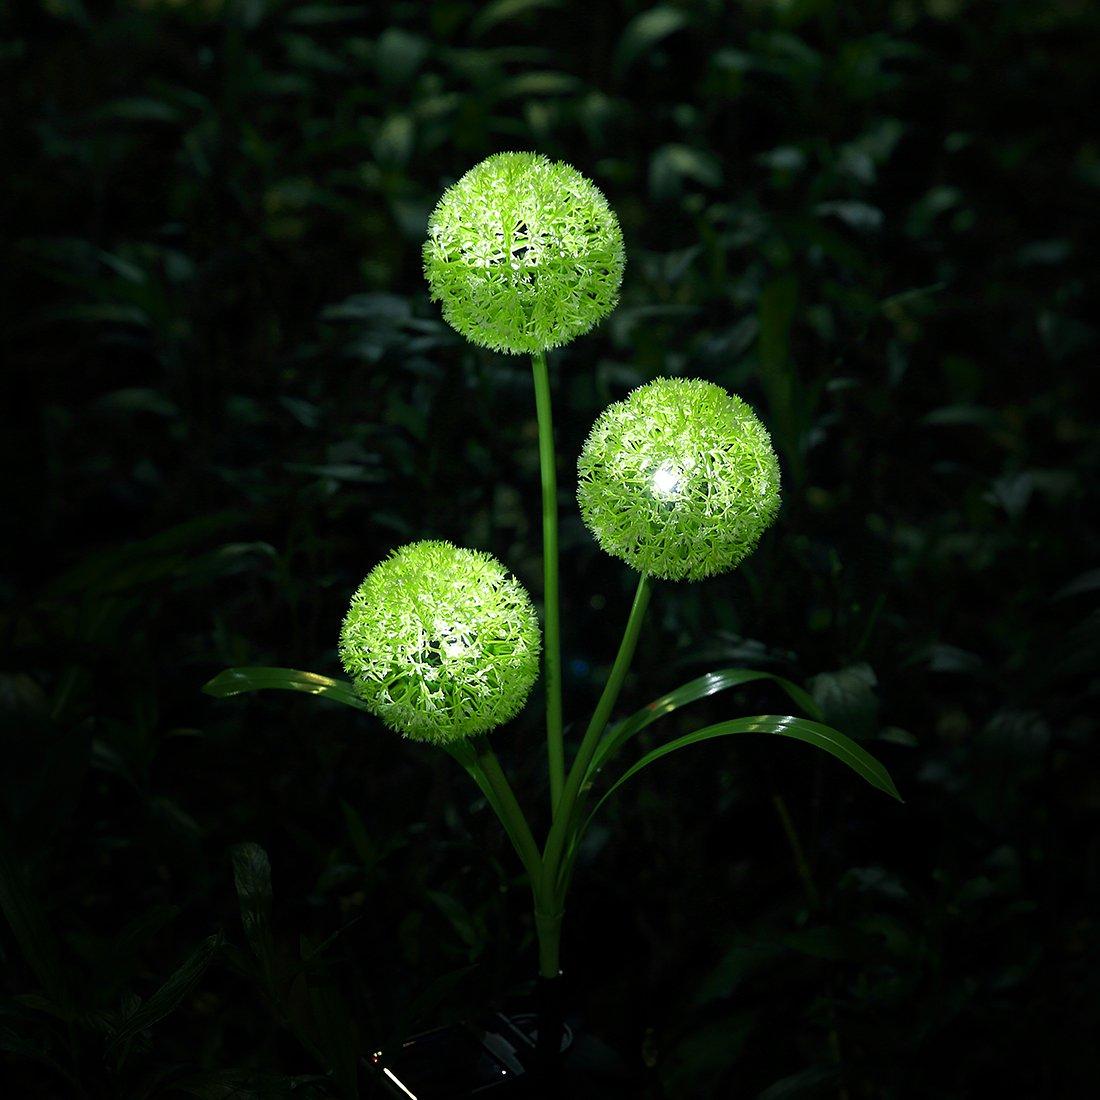 XLUX Outdoor Decorative Solar dandelion LED Lights, Green